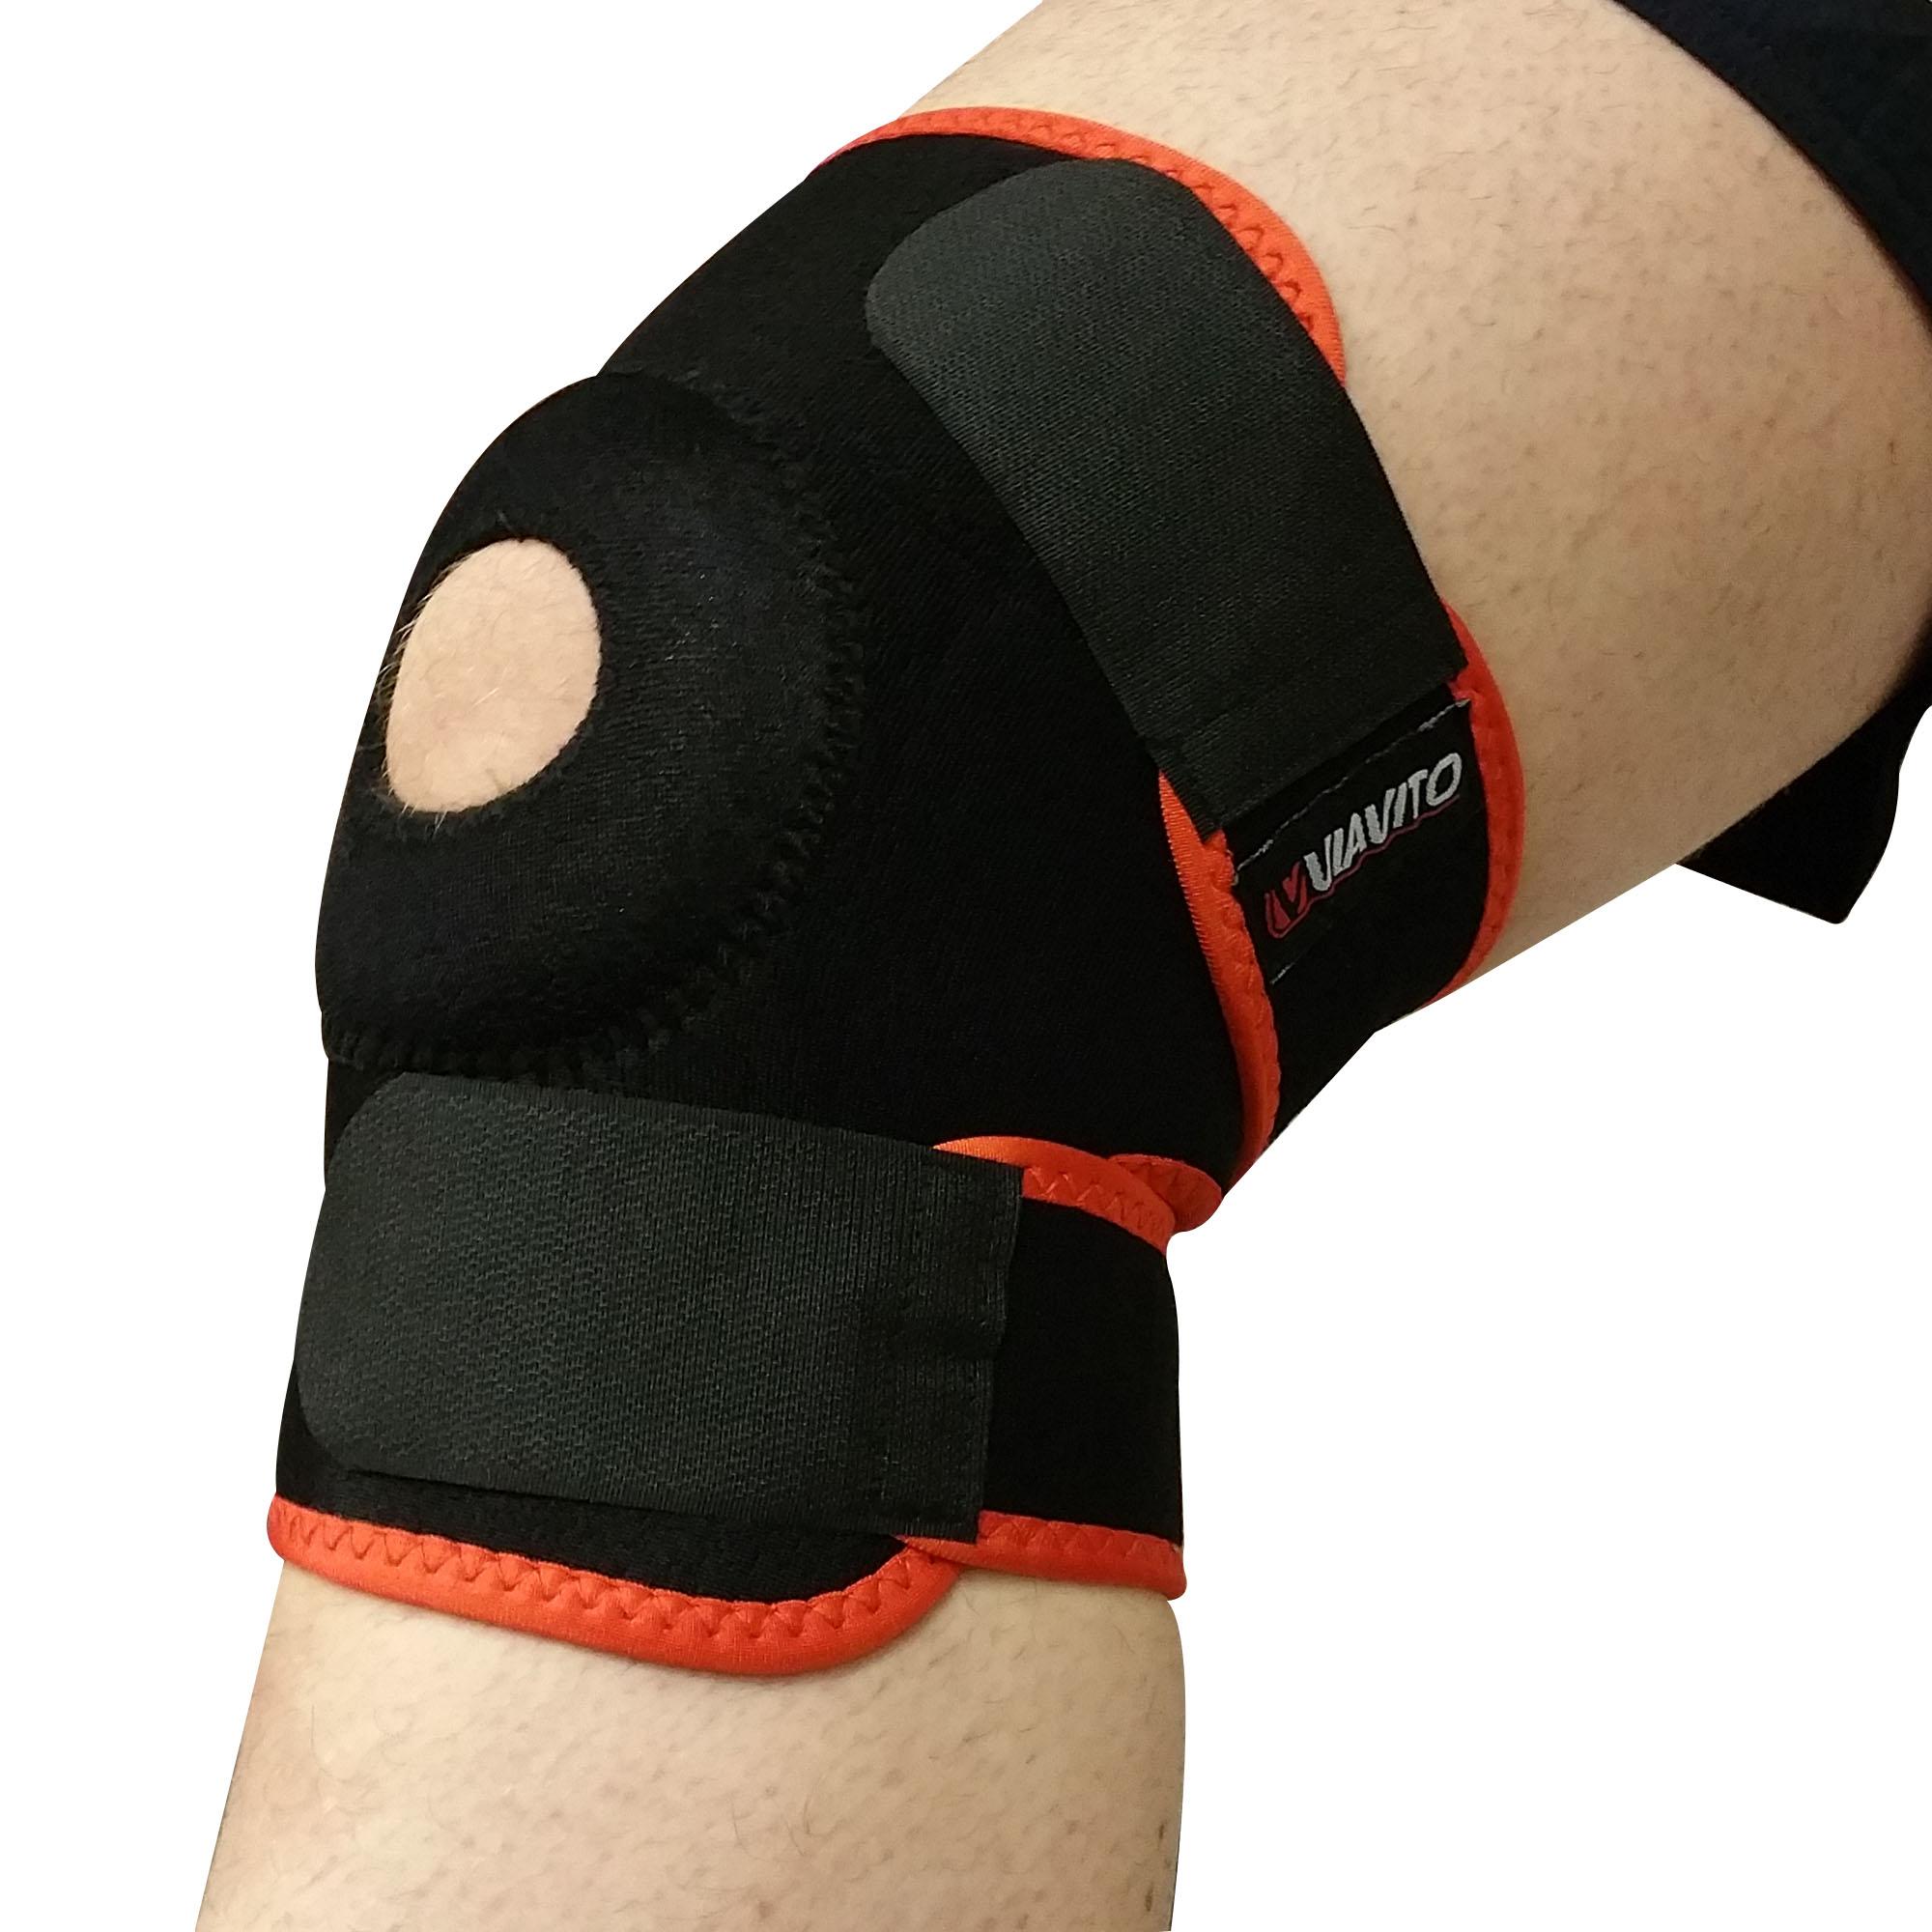 Viavito Neoprene Knee Support